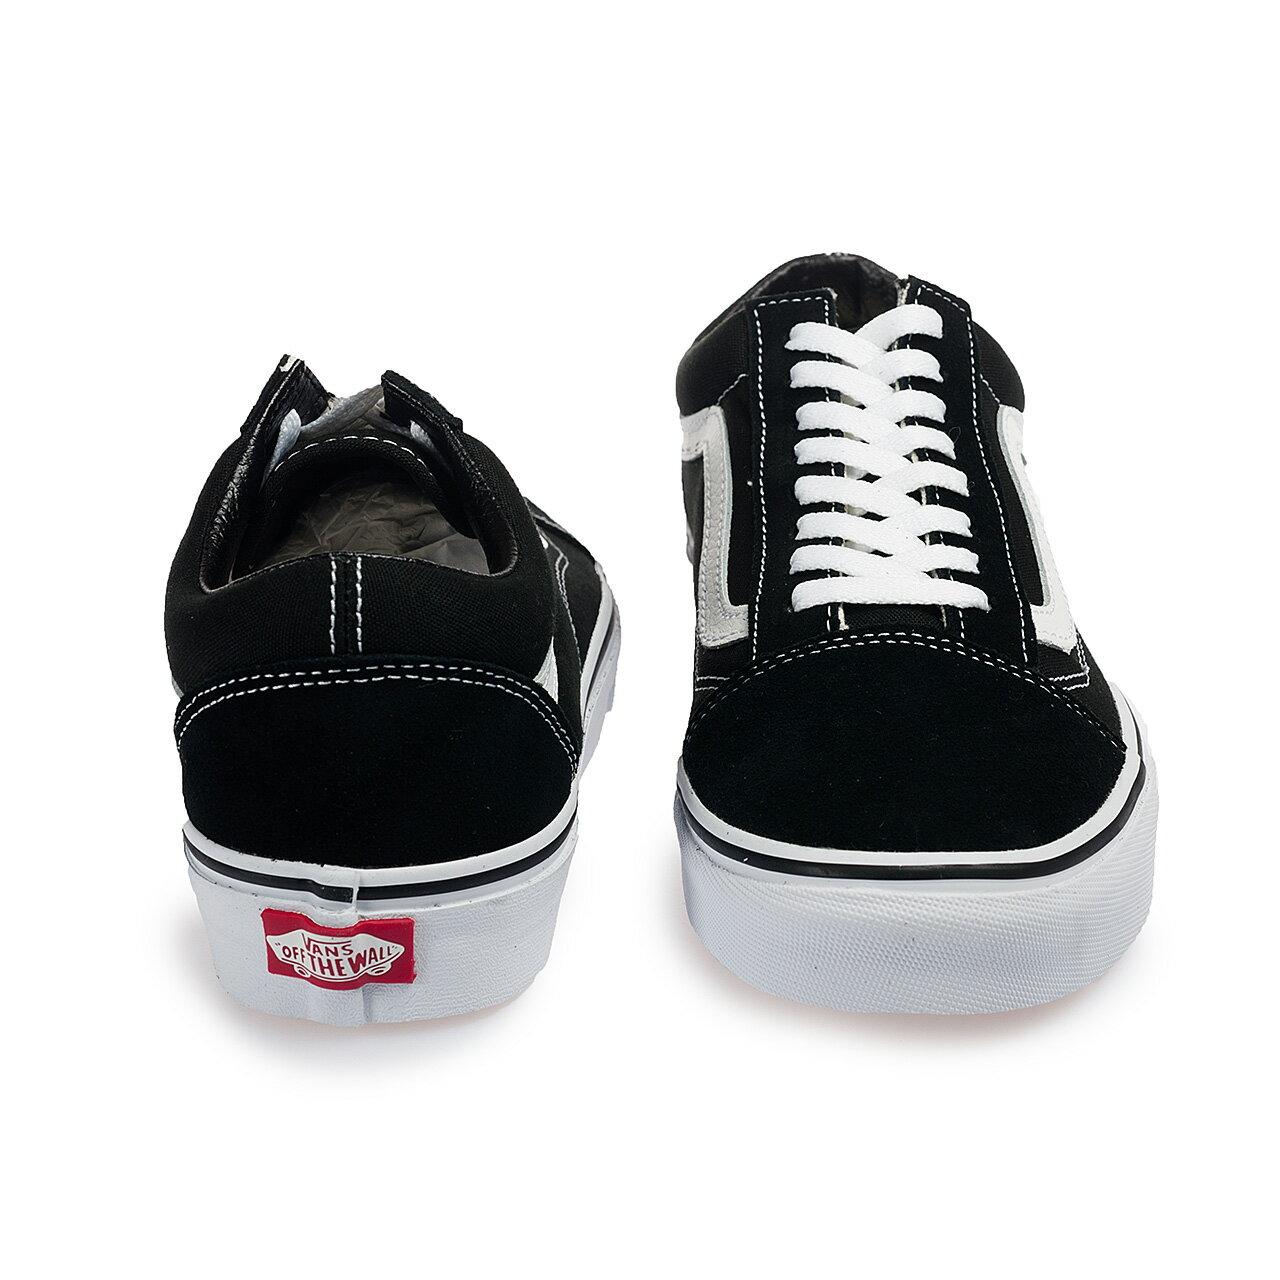 【VANS】Old Skool 基本款  黑 經典款 休閒鞋 男女 專櫃價2380  VN000D3HY28(palace store) 6